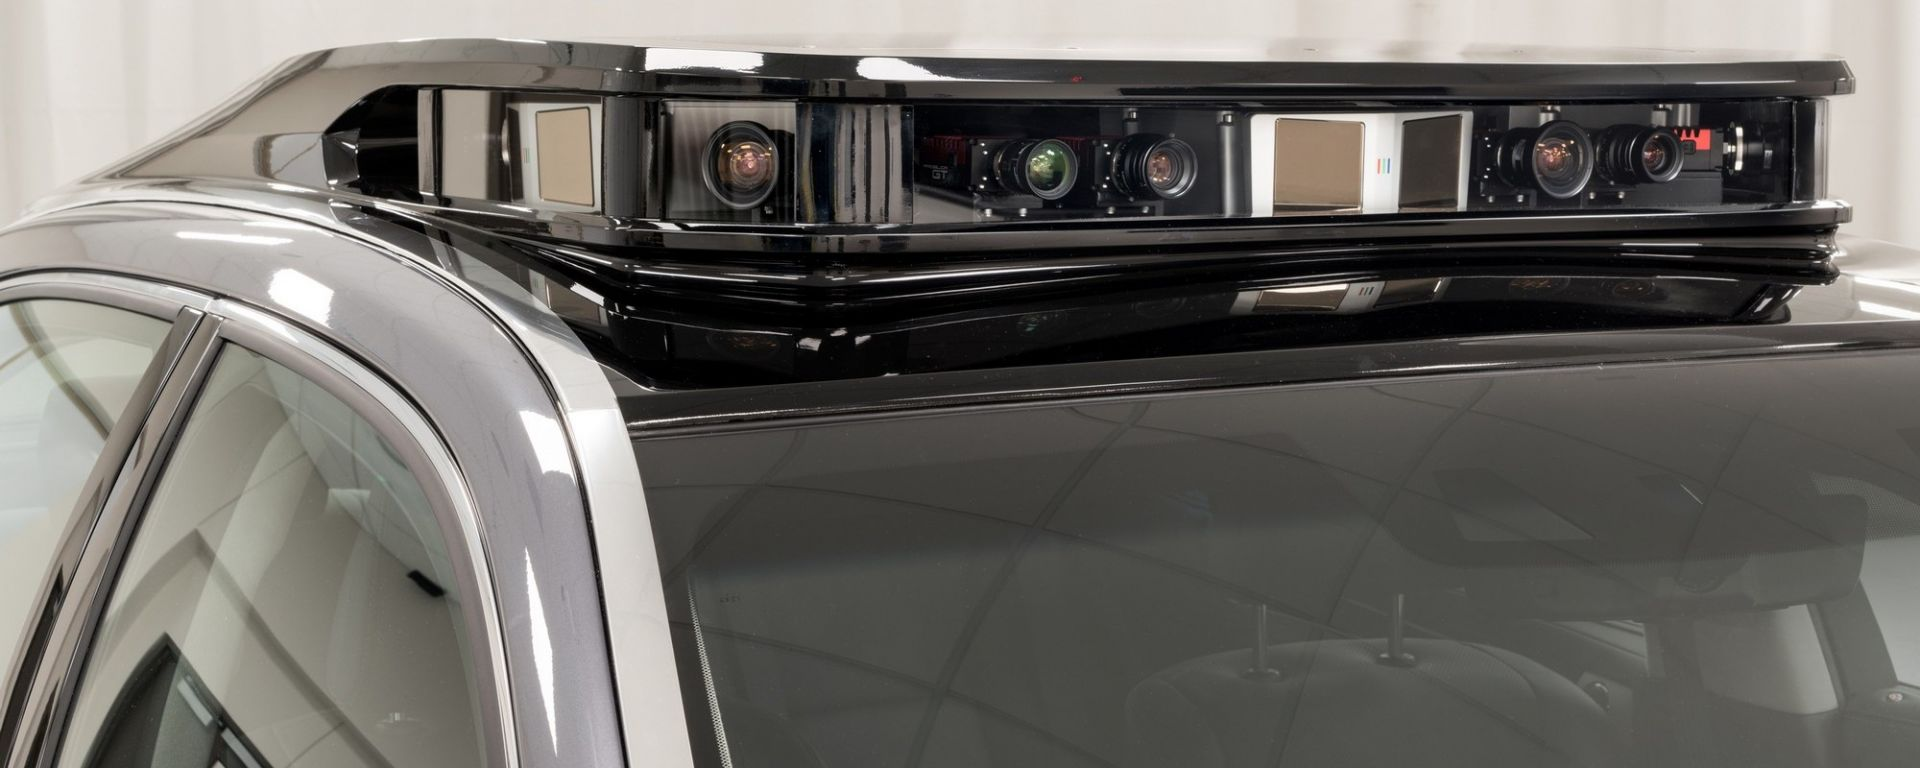 Toyota Platform 3.0, sensori Lidar dal range di 200 metri